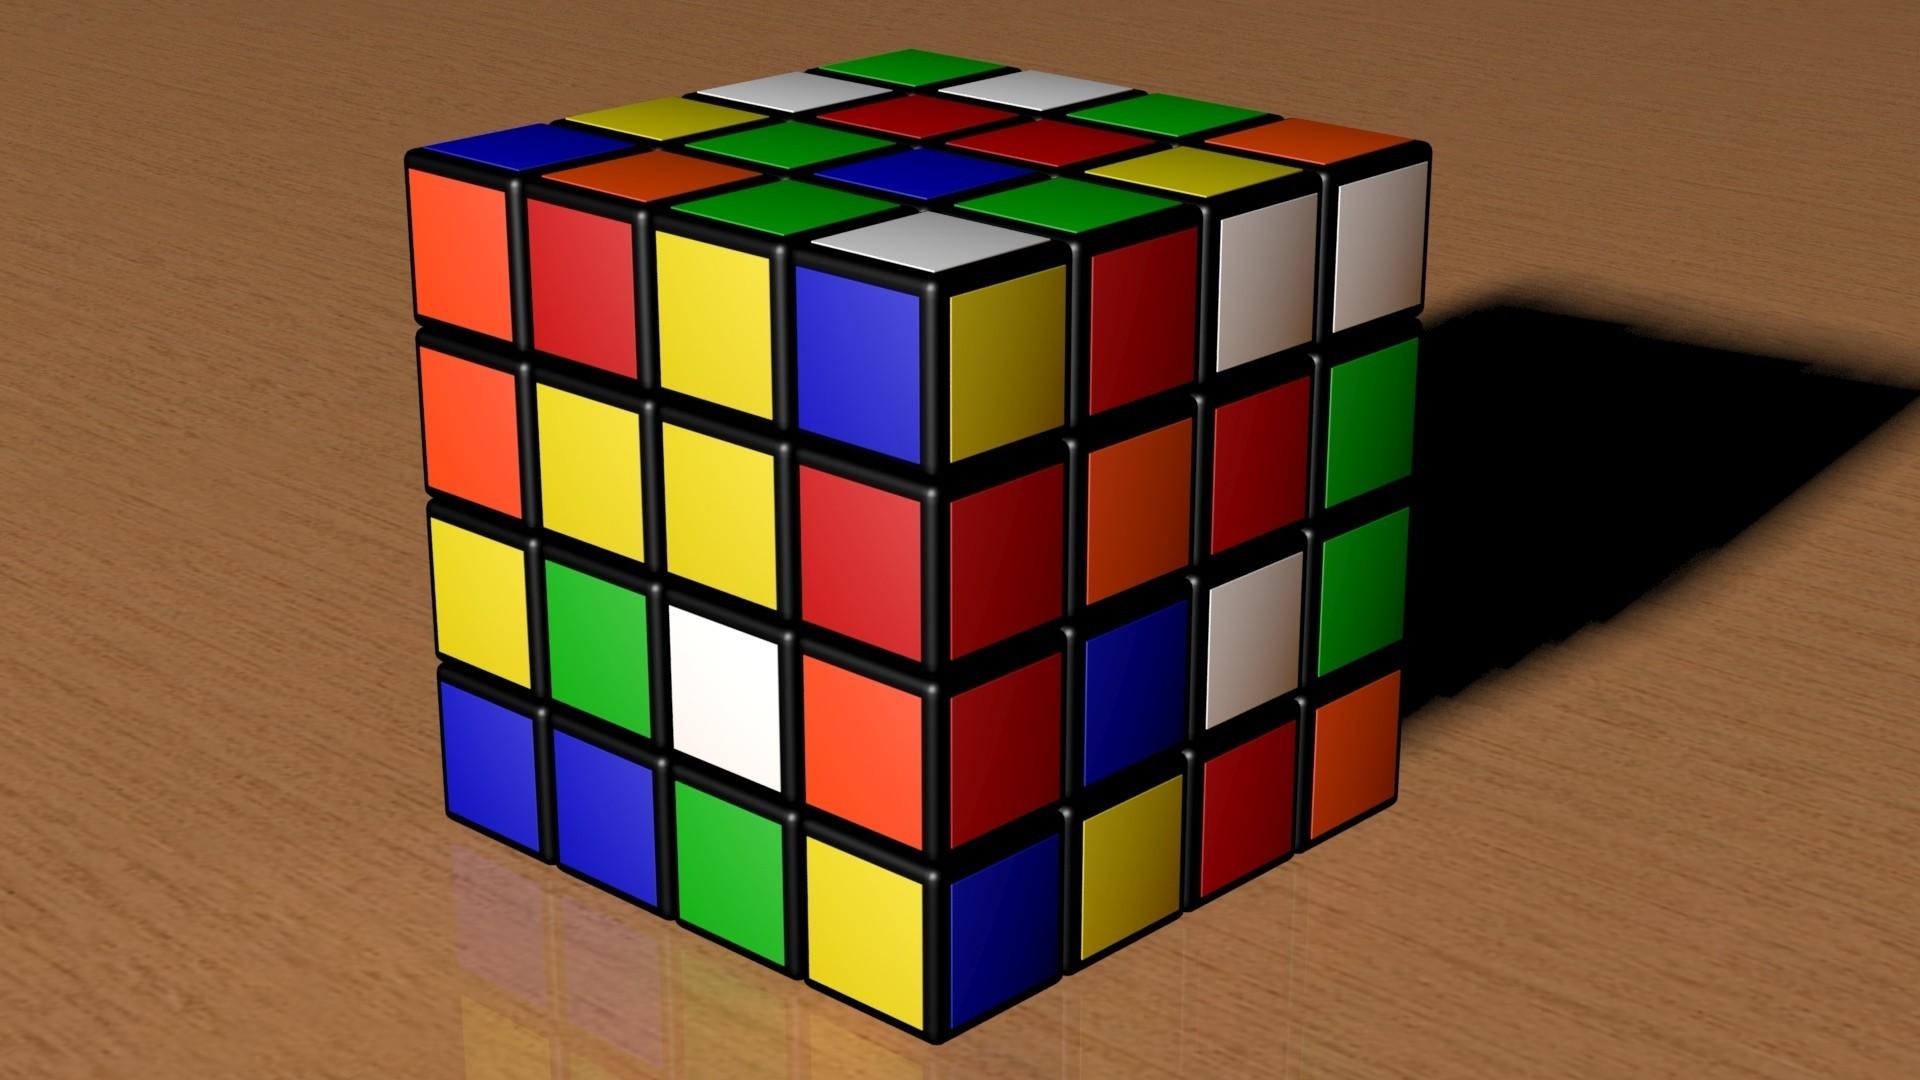 4k.jpg Download STL file 4X4 SCRAMBLED RUBIK'S CUBE • 3D printer template, Knight1341